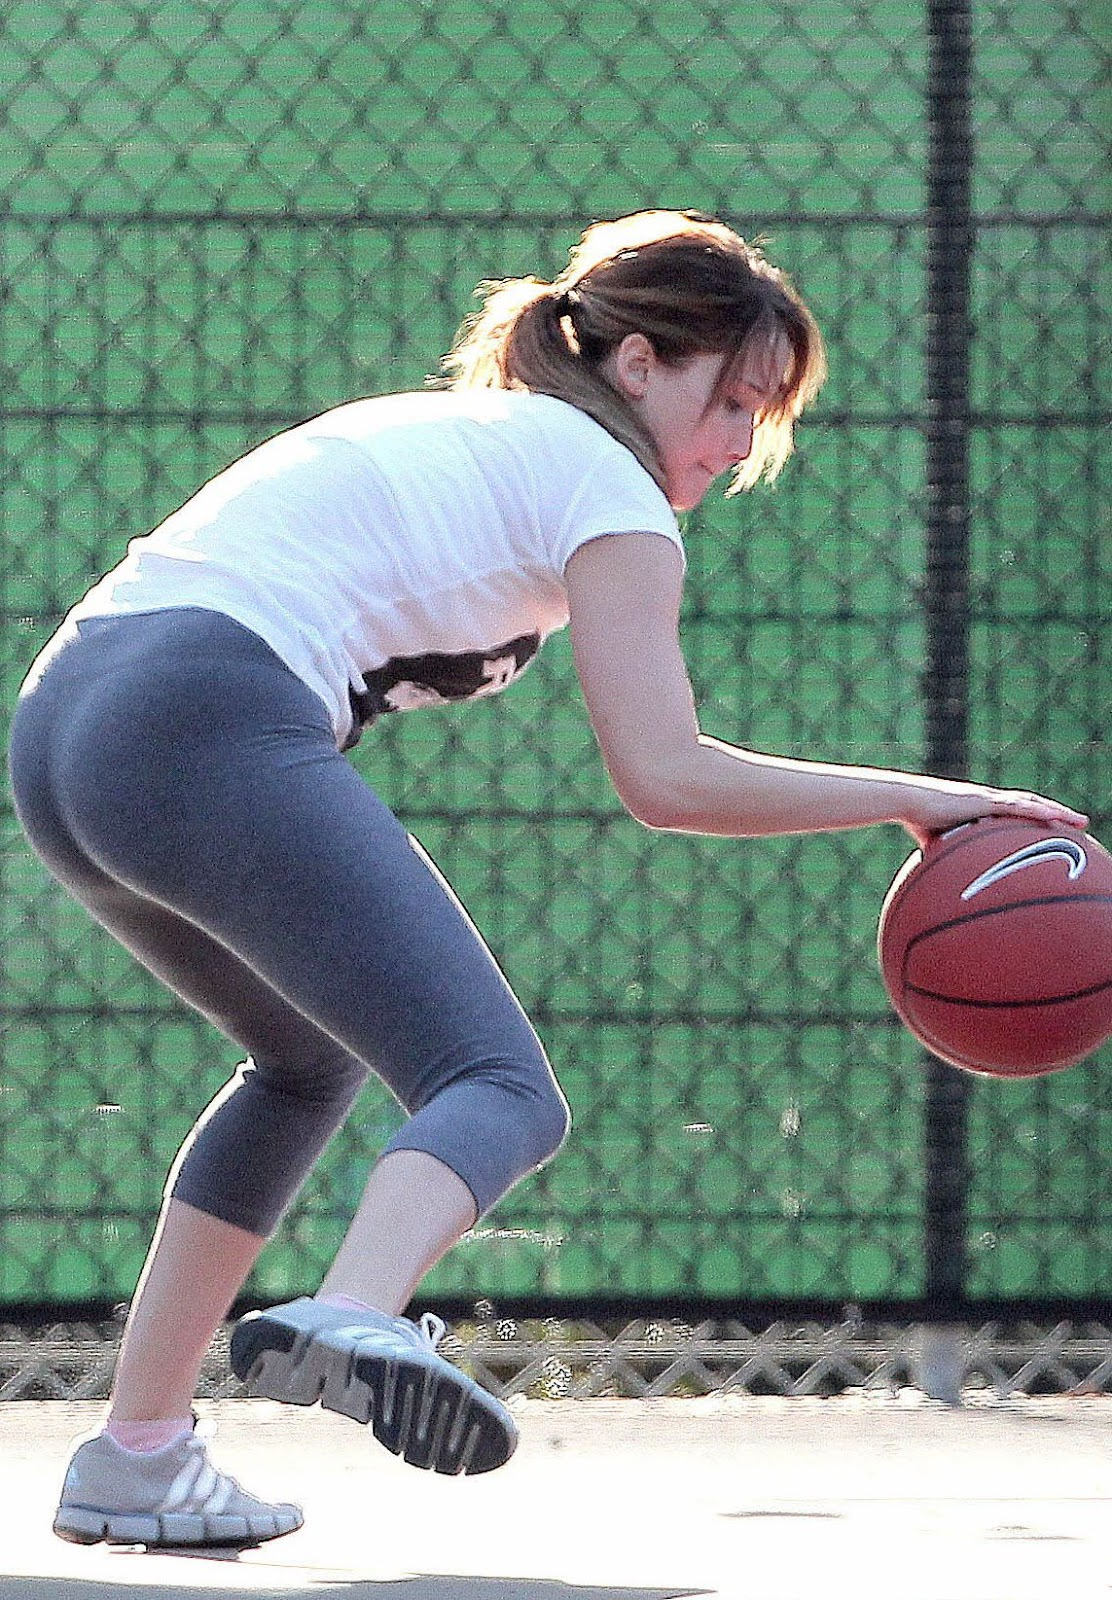 http://1.bp.blogspot.com/-rvPoInmWPXk/UCp8eX08IEI/AAAAAAAAGc4/w7i-KjxsgD8/s1600/jennifer_lawrence_basketball_candid_tdpryfr.jpg